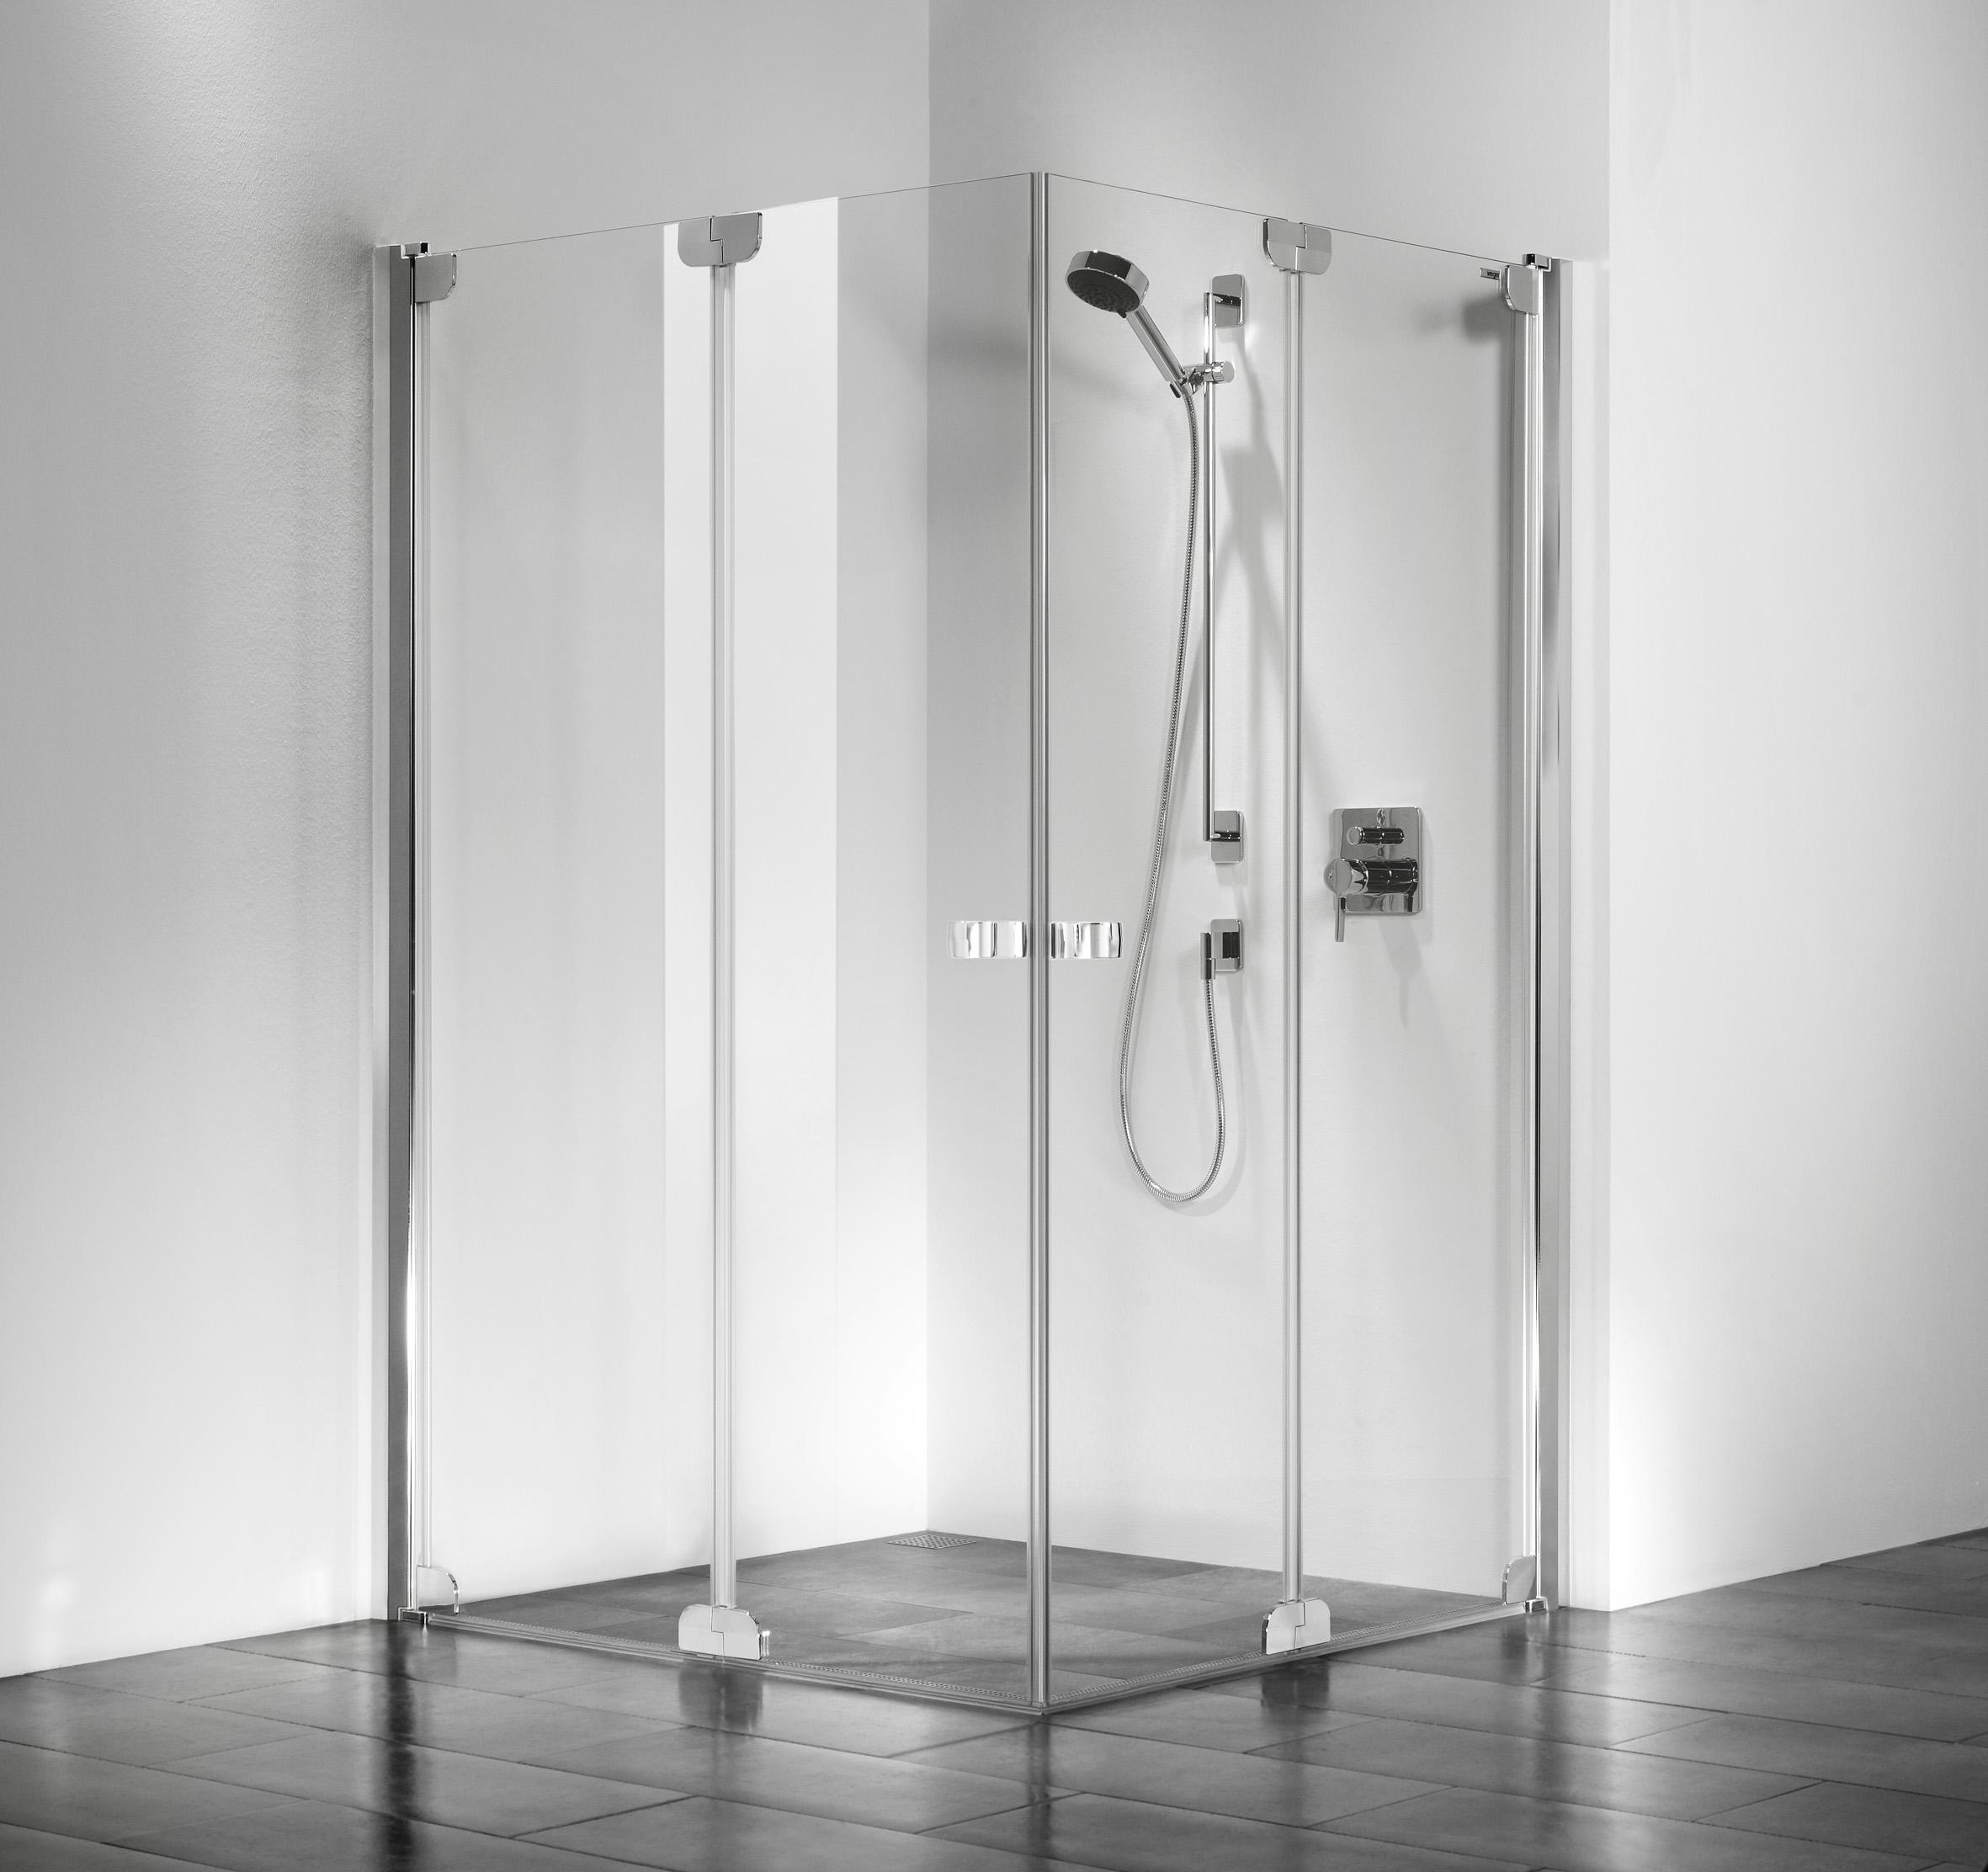 Dusche Zum Wegklappen : Die Dusche zum Wegklappen